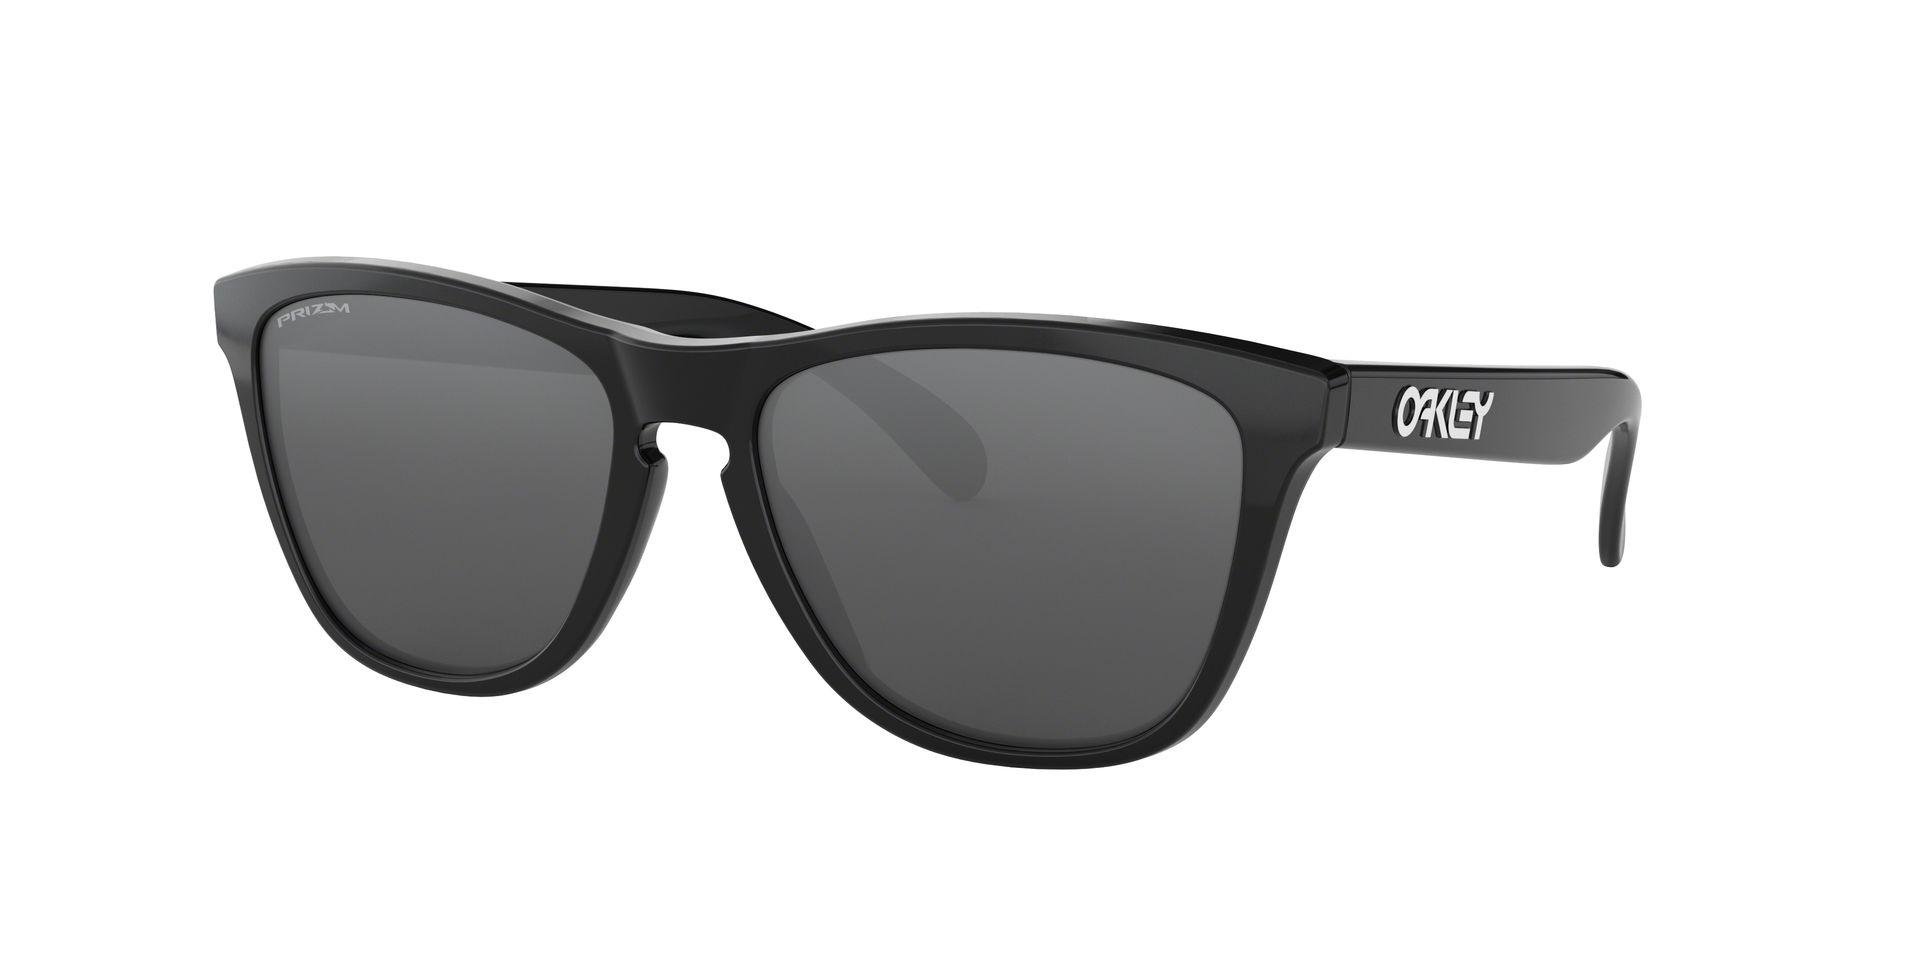 Oakley Frogskins PRIZM - OO9245 924562 - size 54 2cc34ddfb4